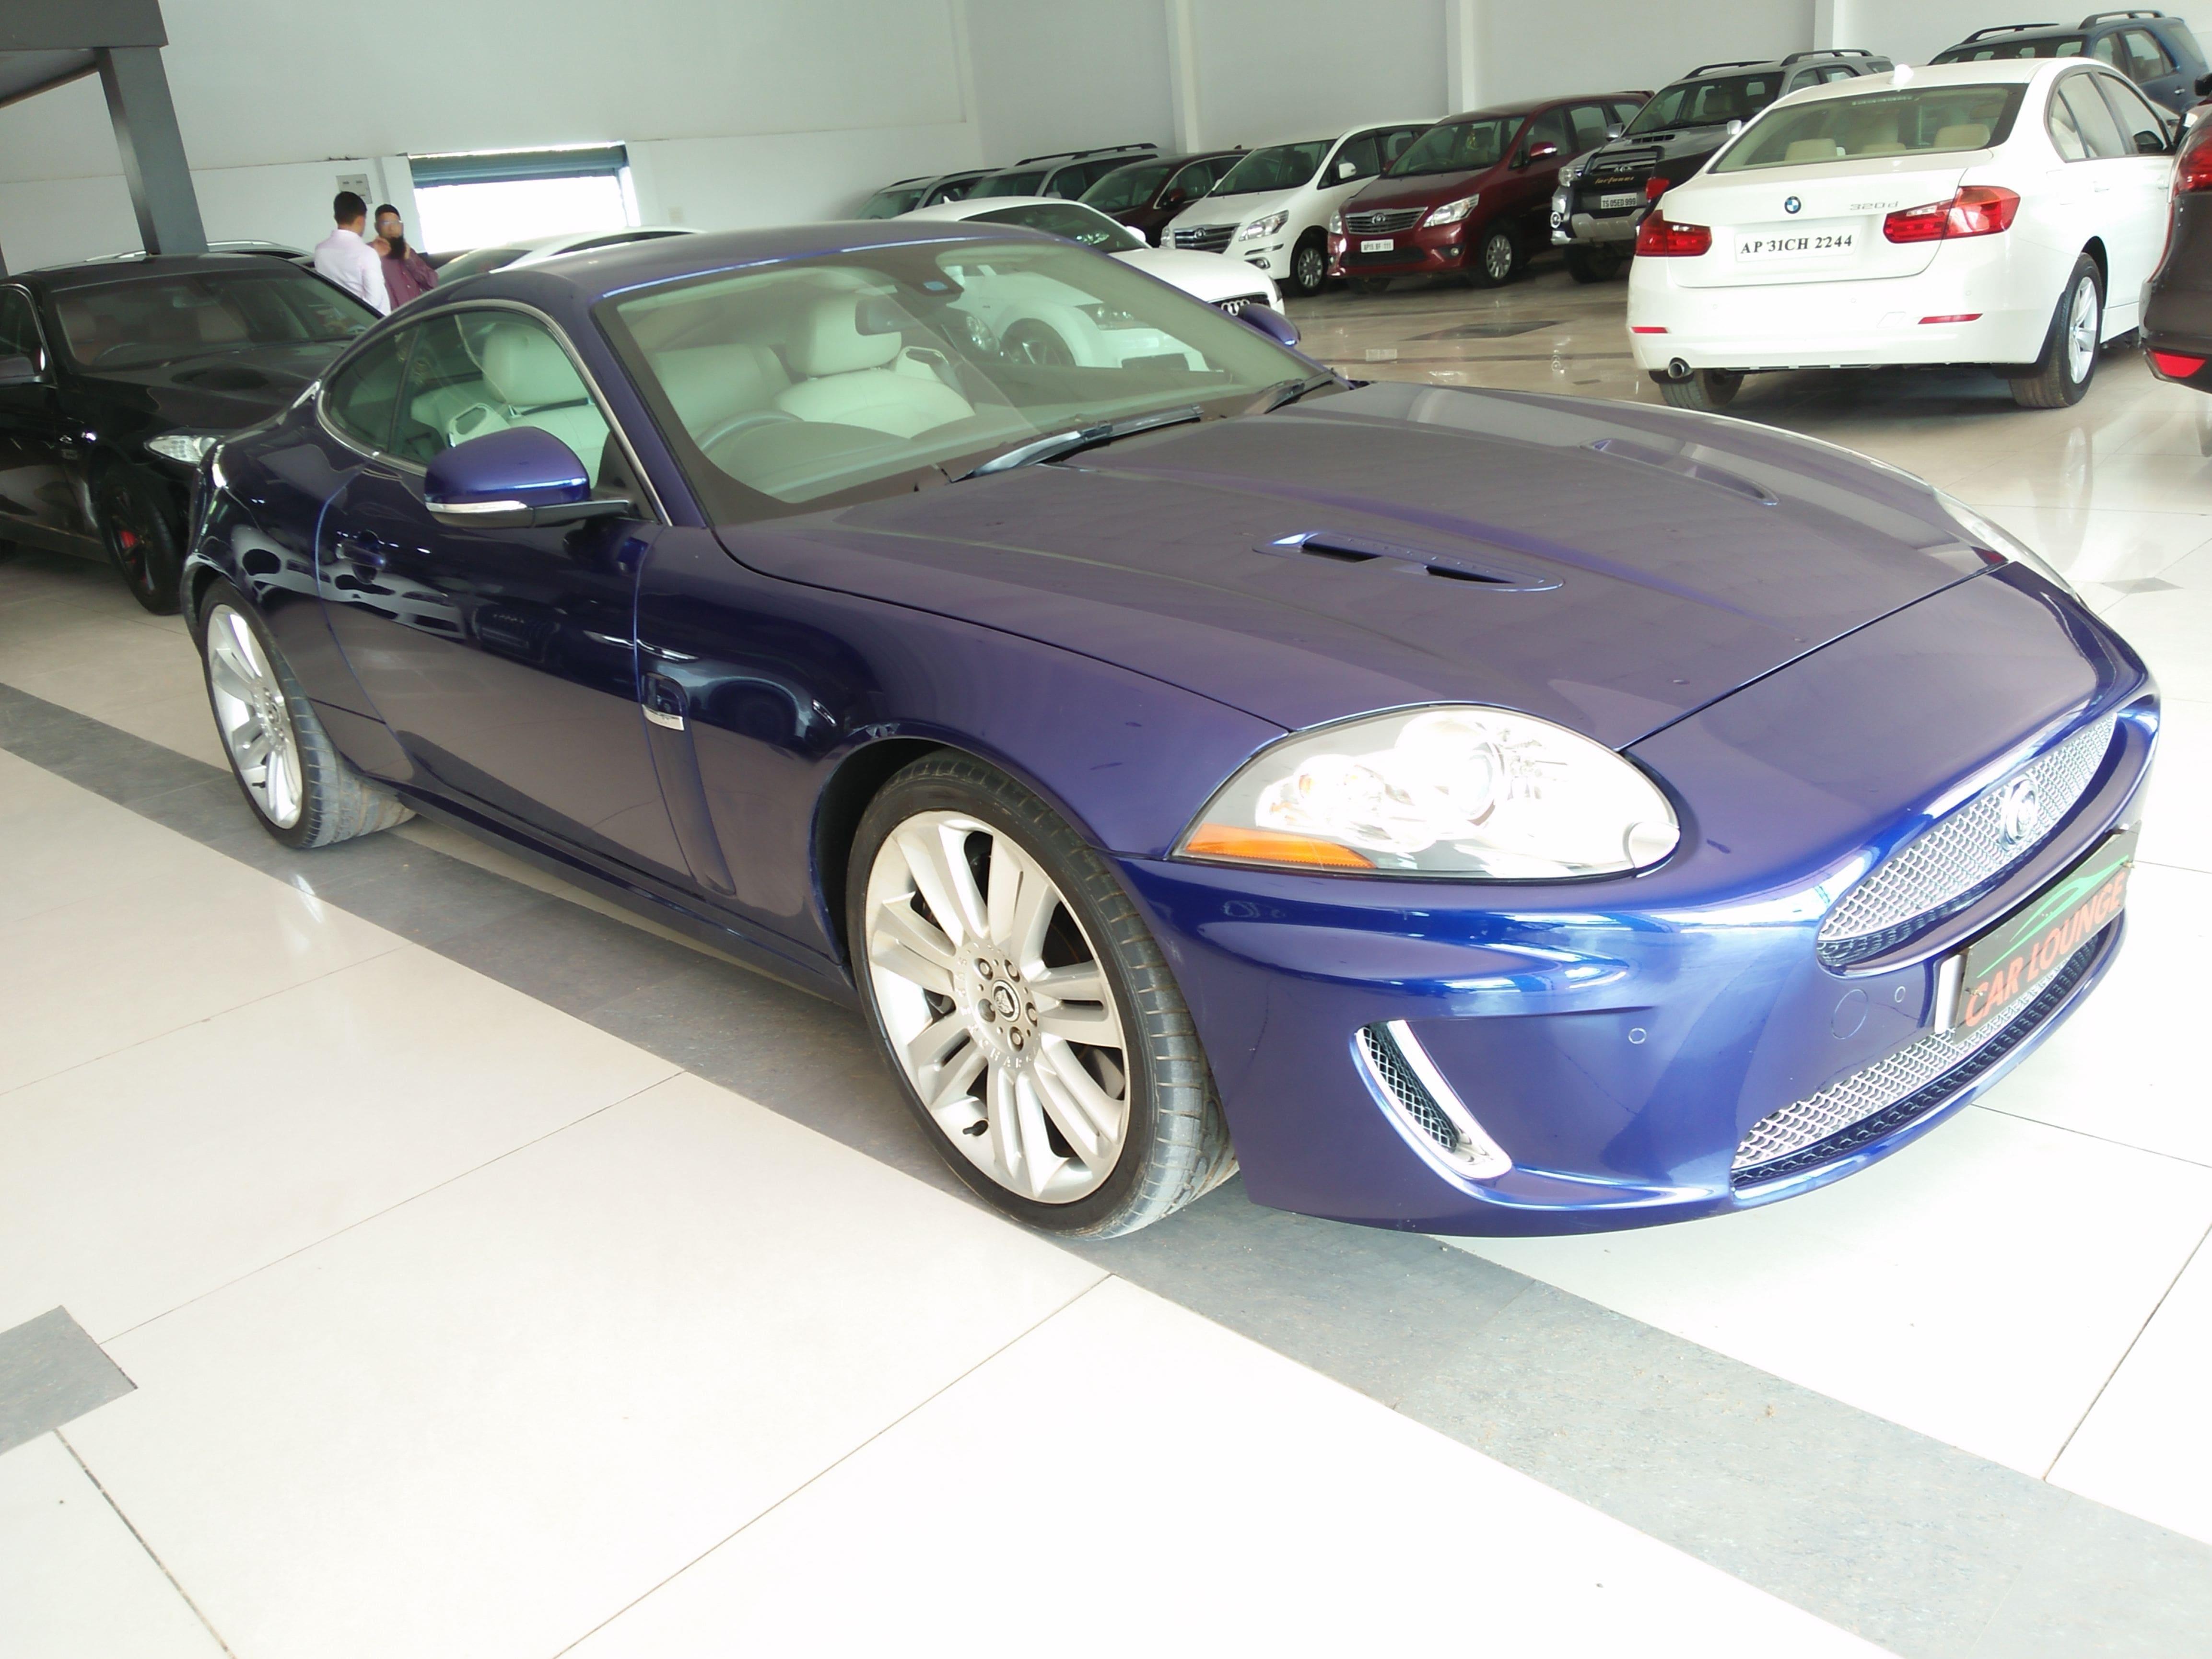 Jaguar Xkr Convertible Price Specs Review Pics